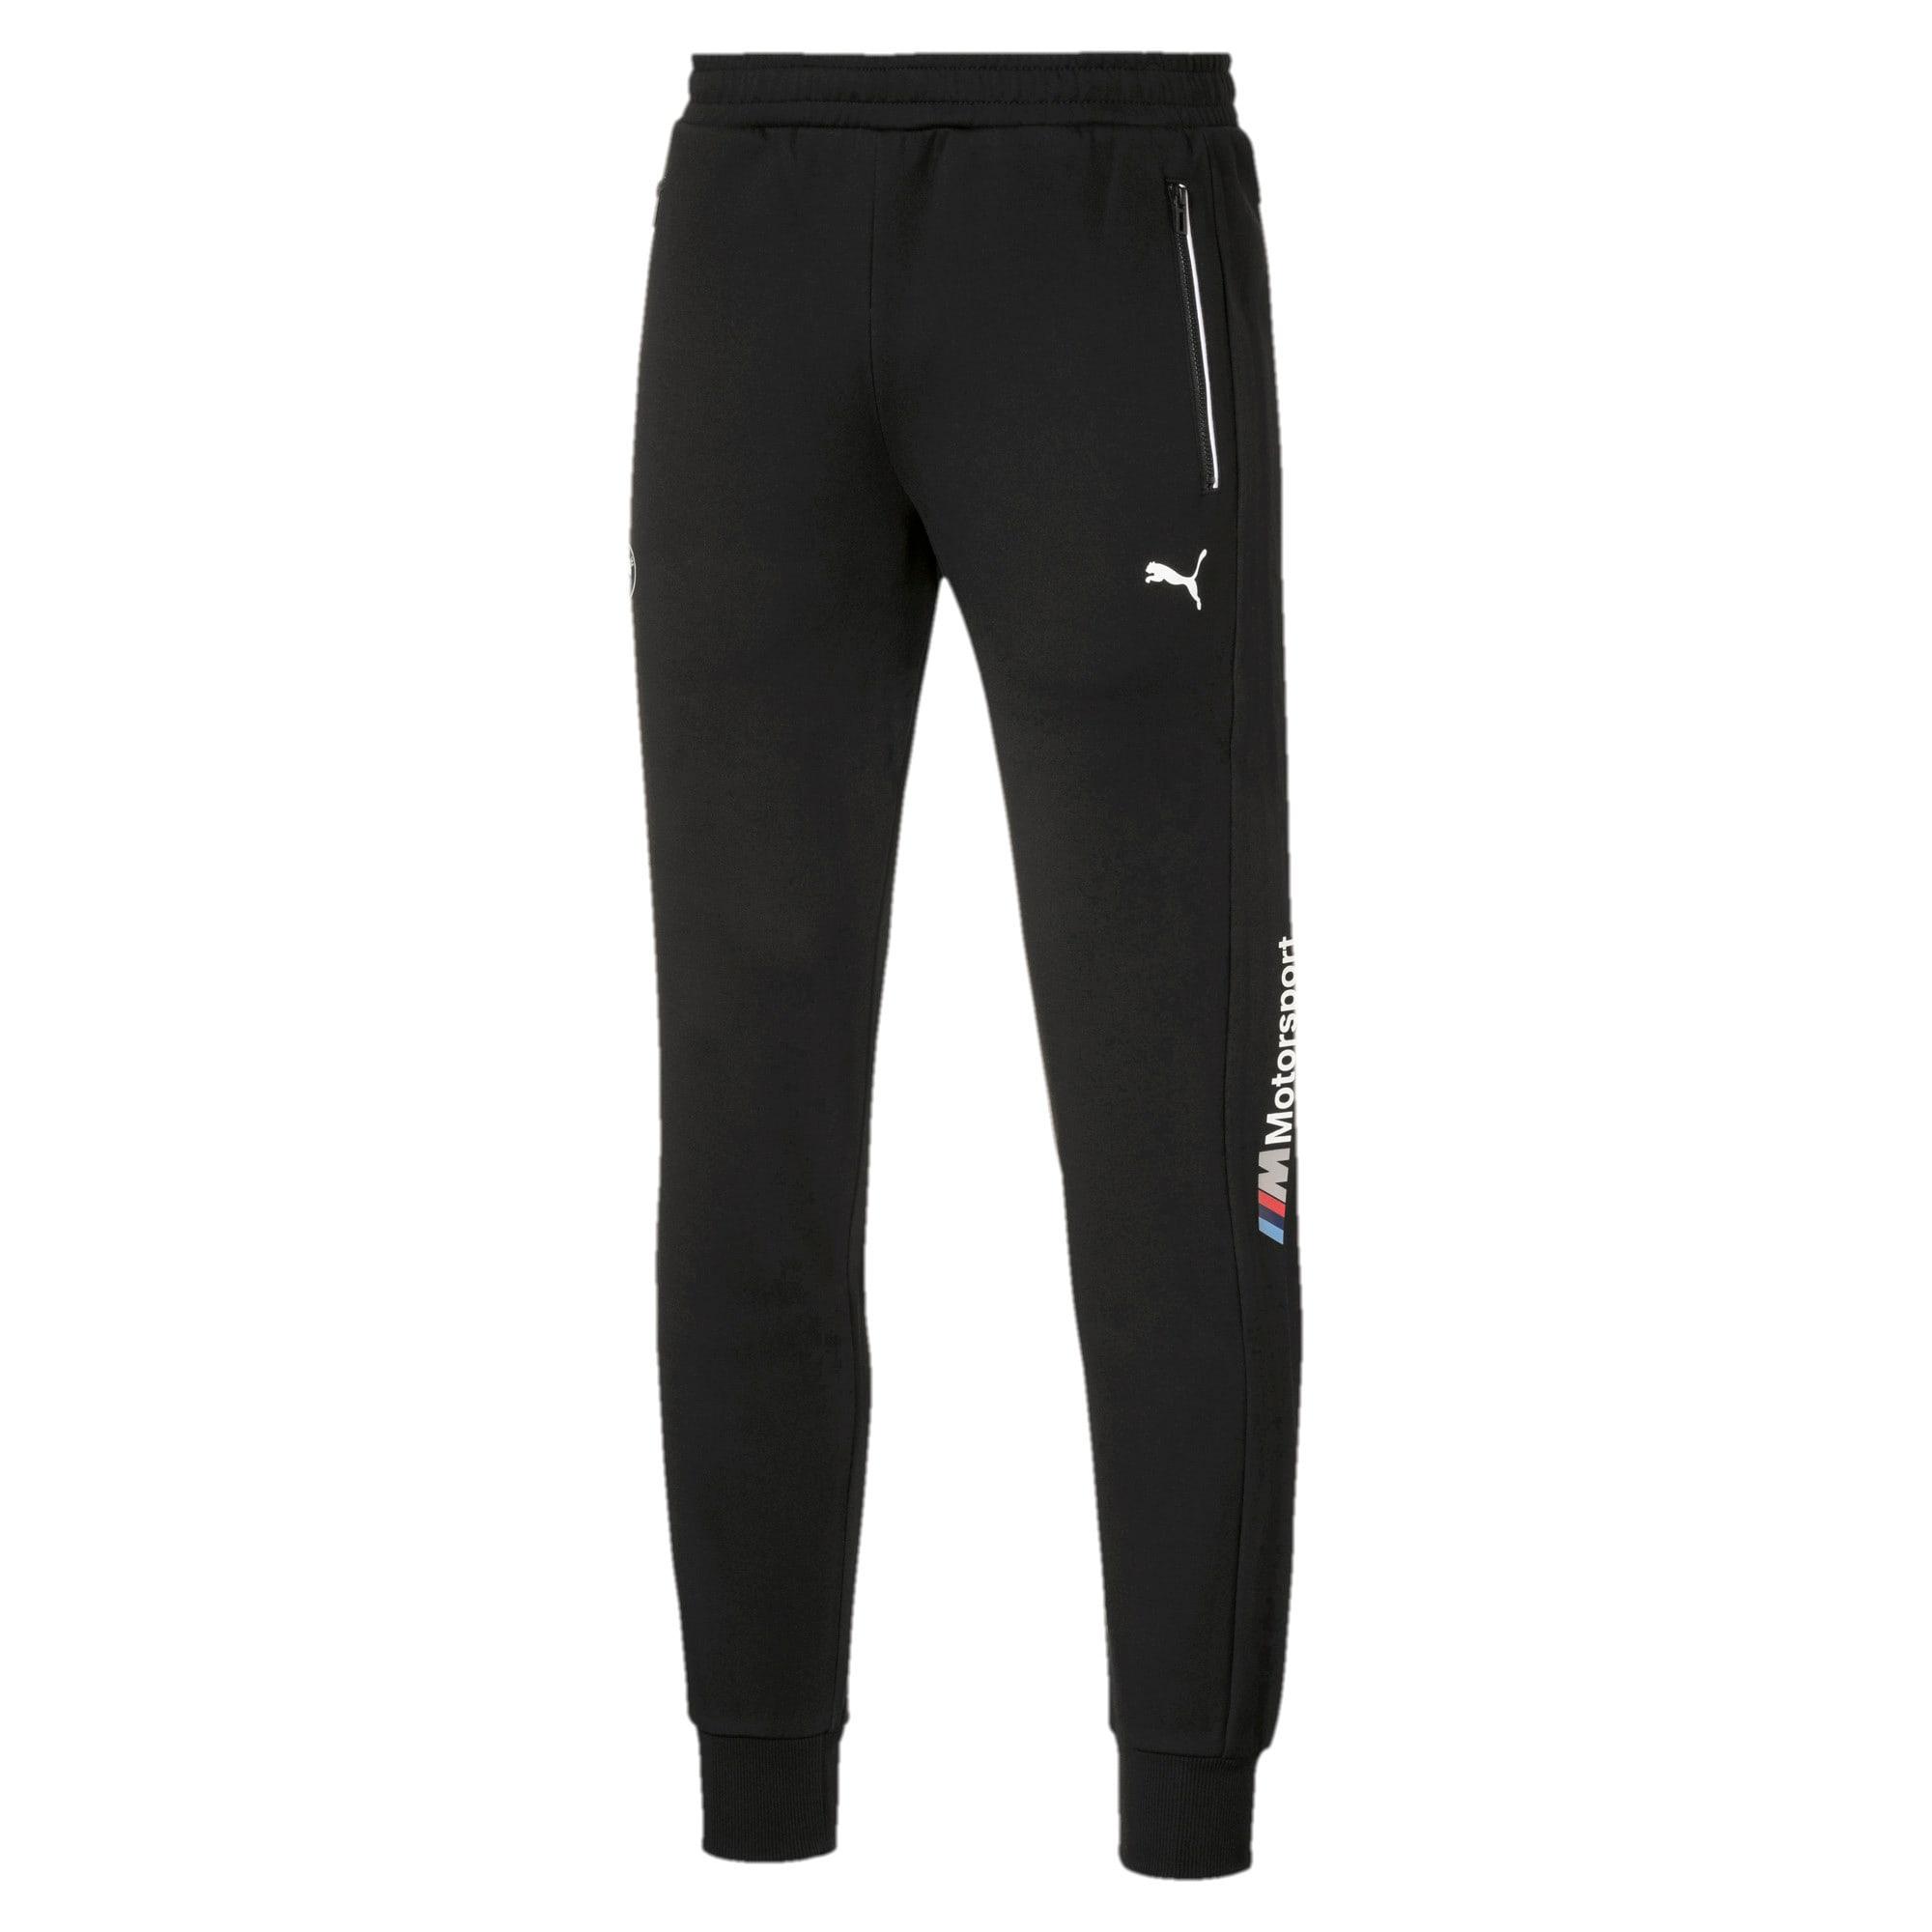 Thumbnail 1 of BMW M Motorsport Knitted Men's Sweatpants, Puma Black, medium